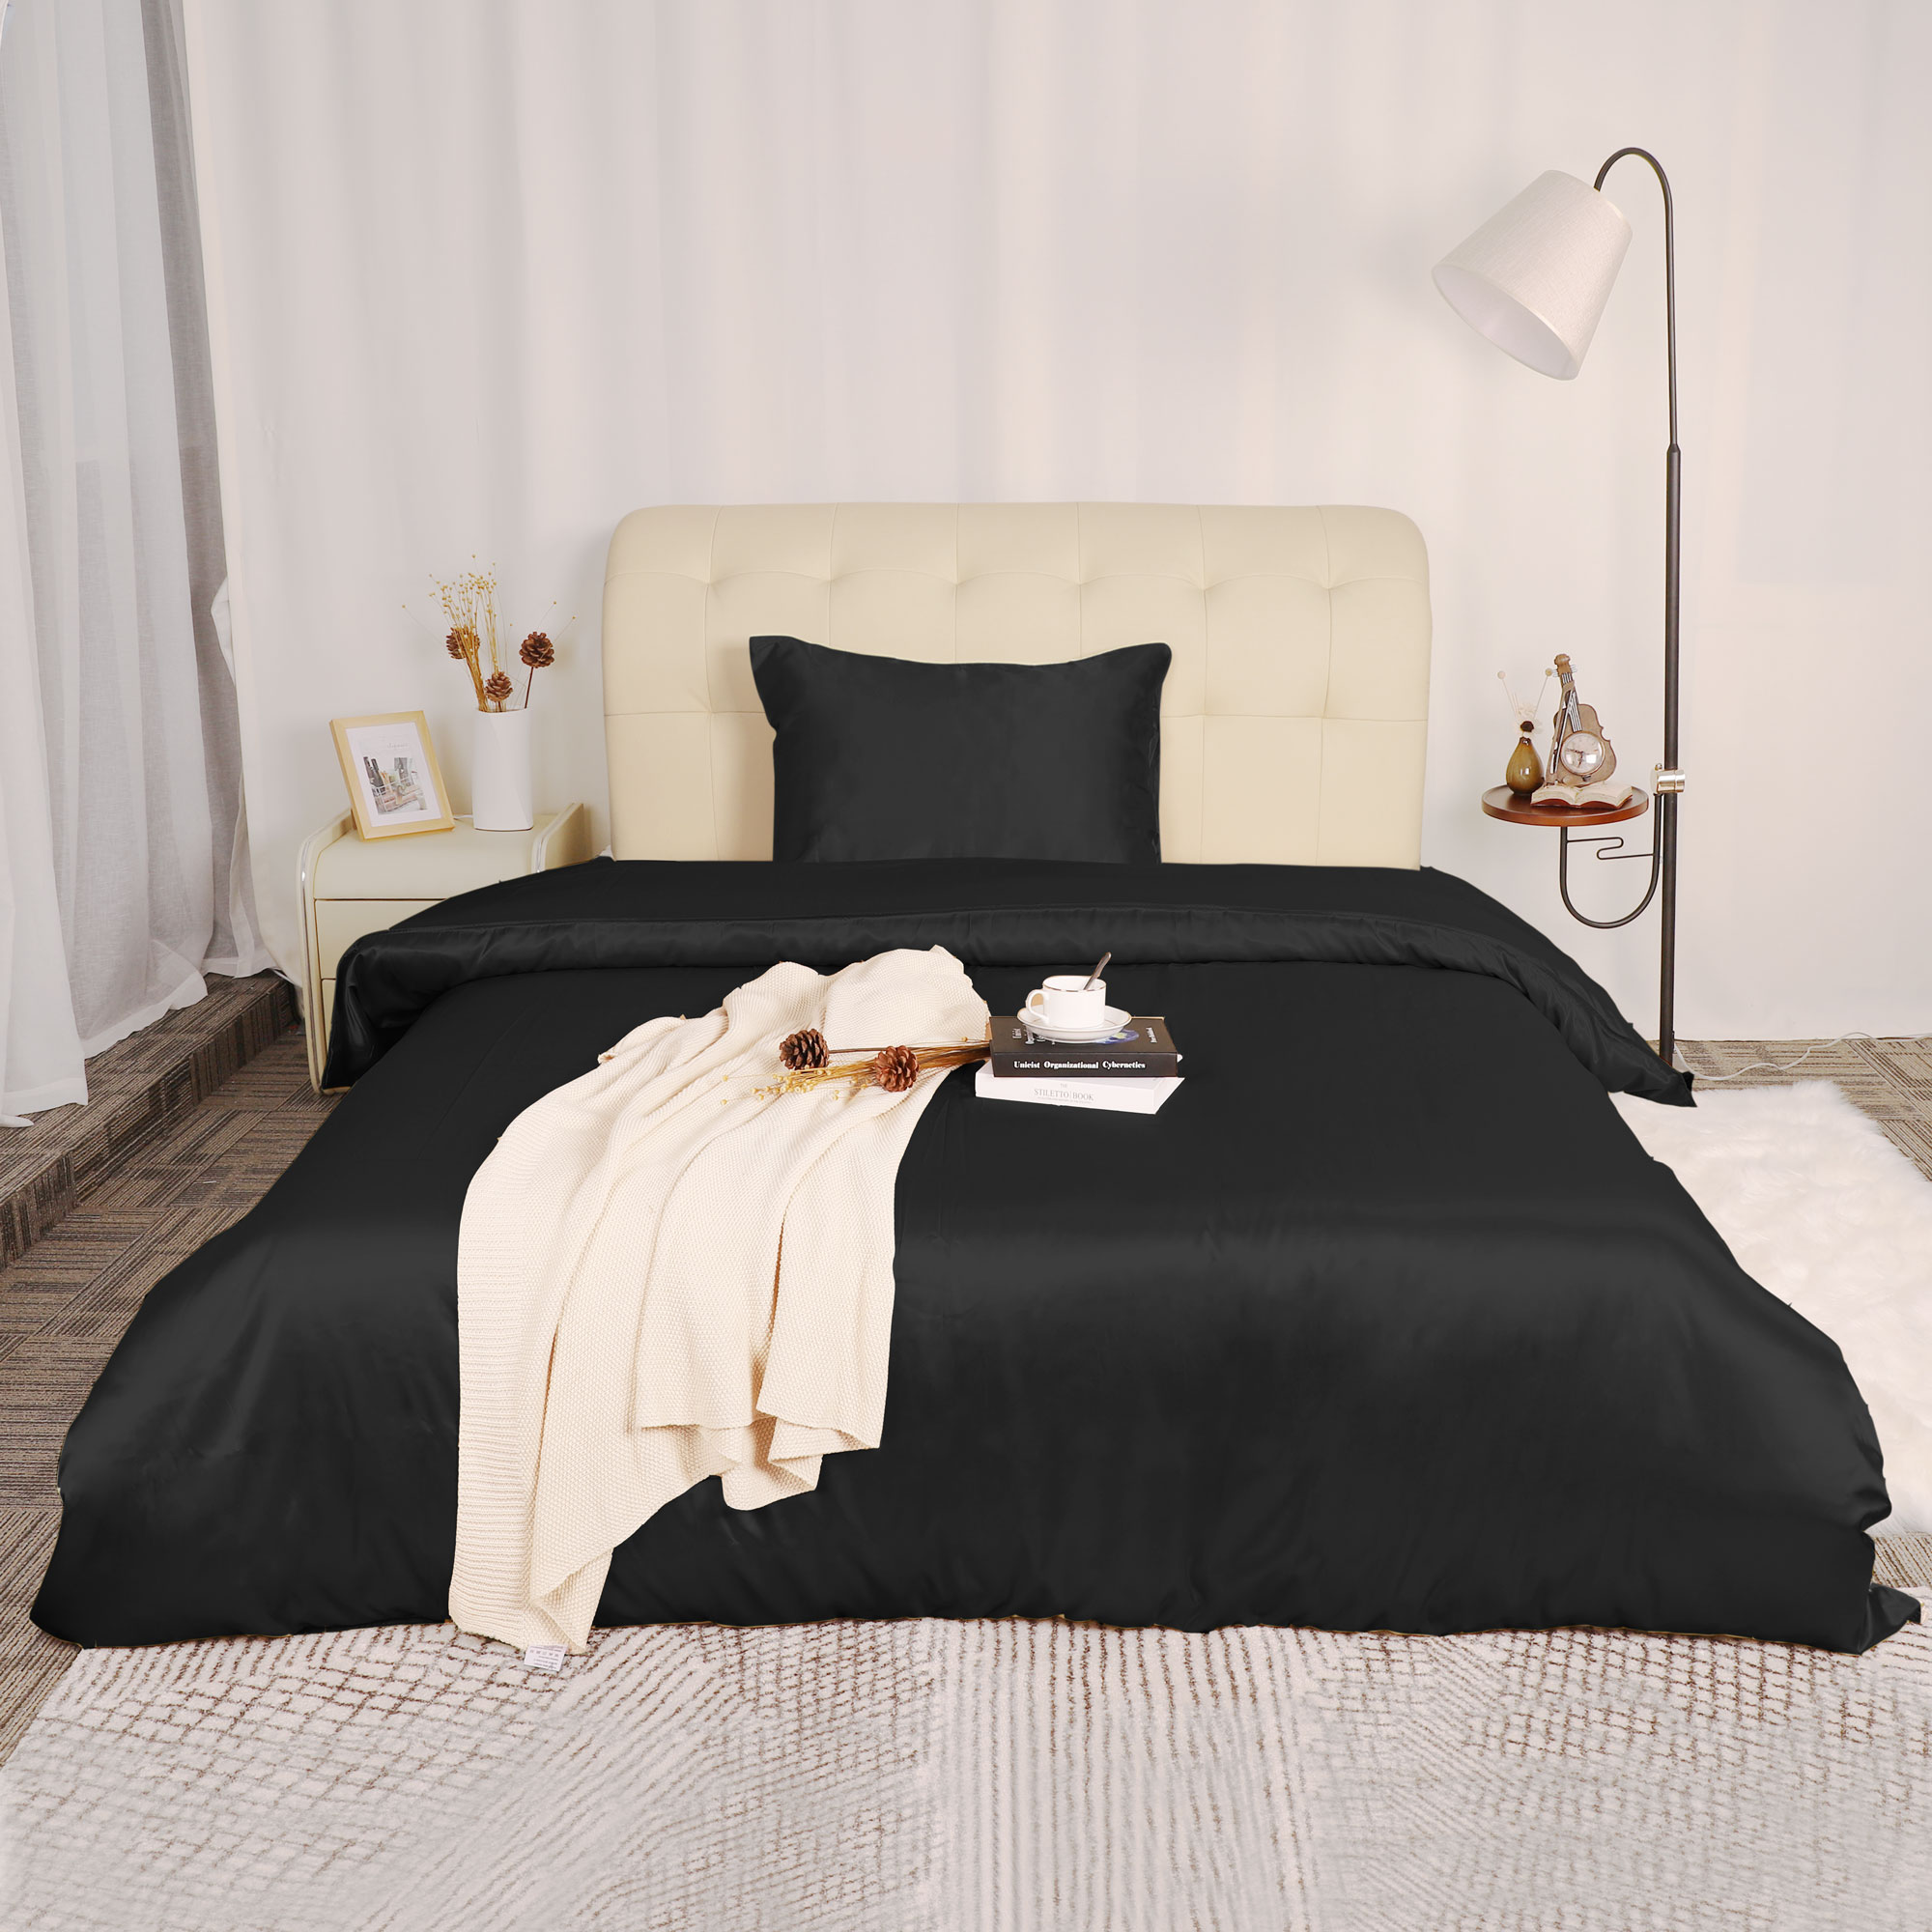 silk satin 2 piece bedding duvet cover and pillow sham set black twin size